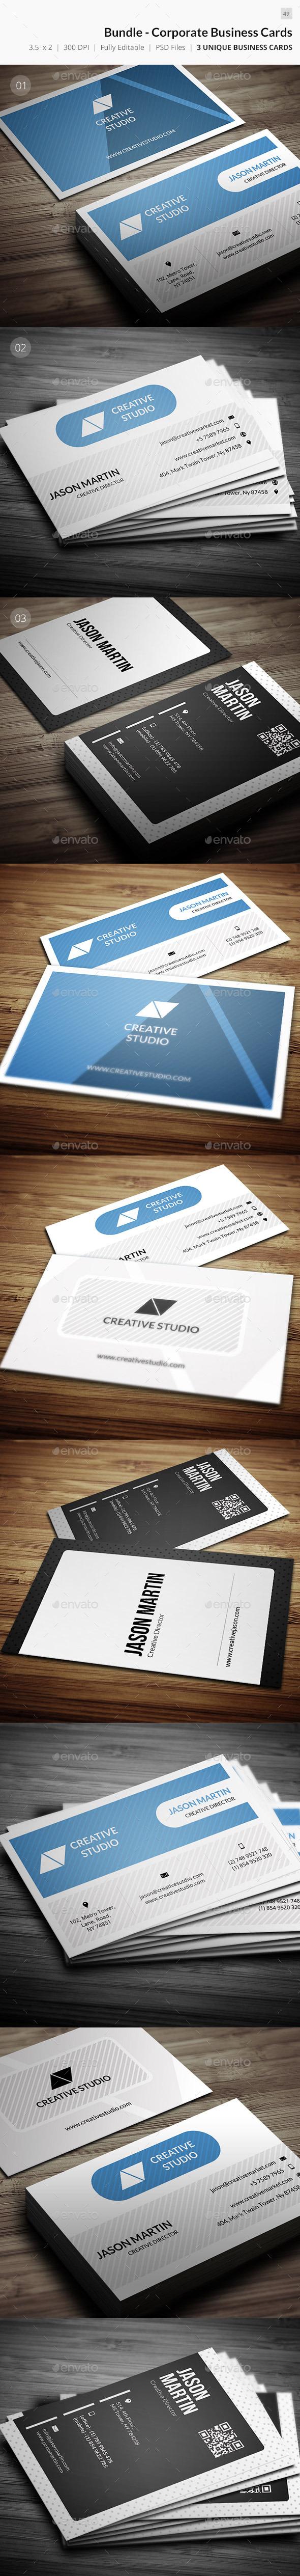 GraphicRiver Bundle Corporate Business Cards 50 9679415